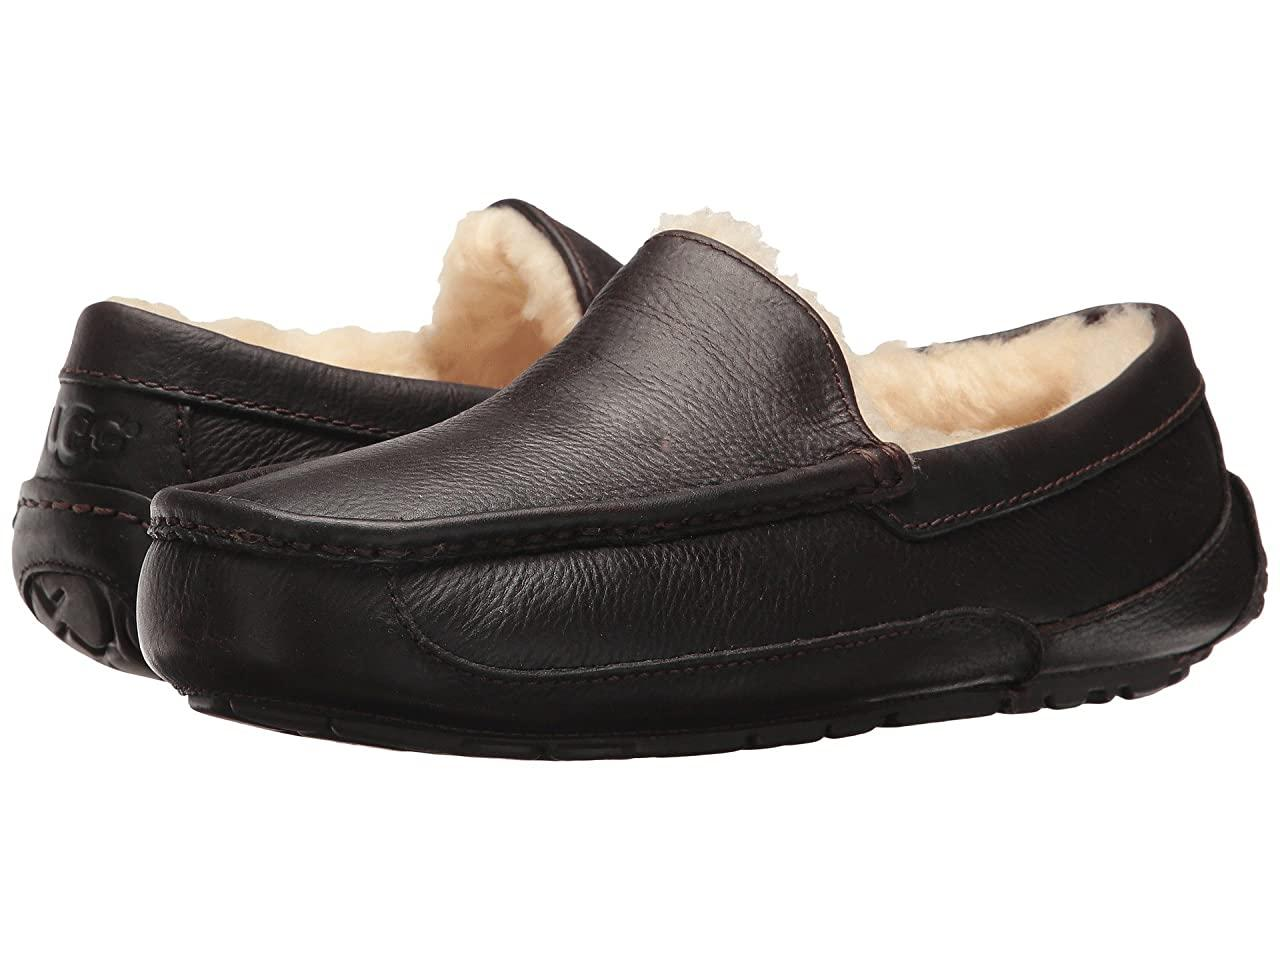 Тапочки (Оригинал) UGG Ascot Leather China Tea Leather